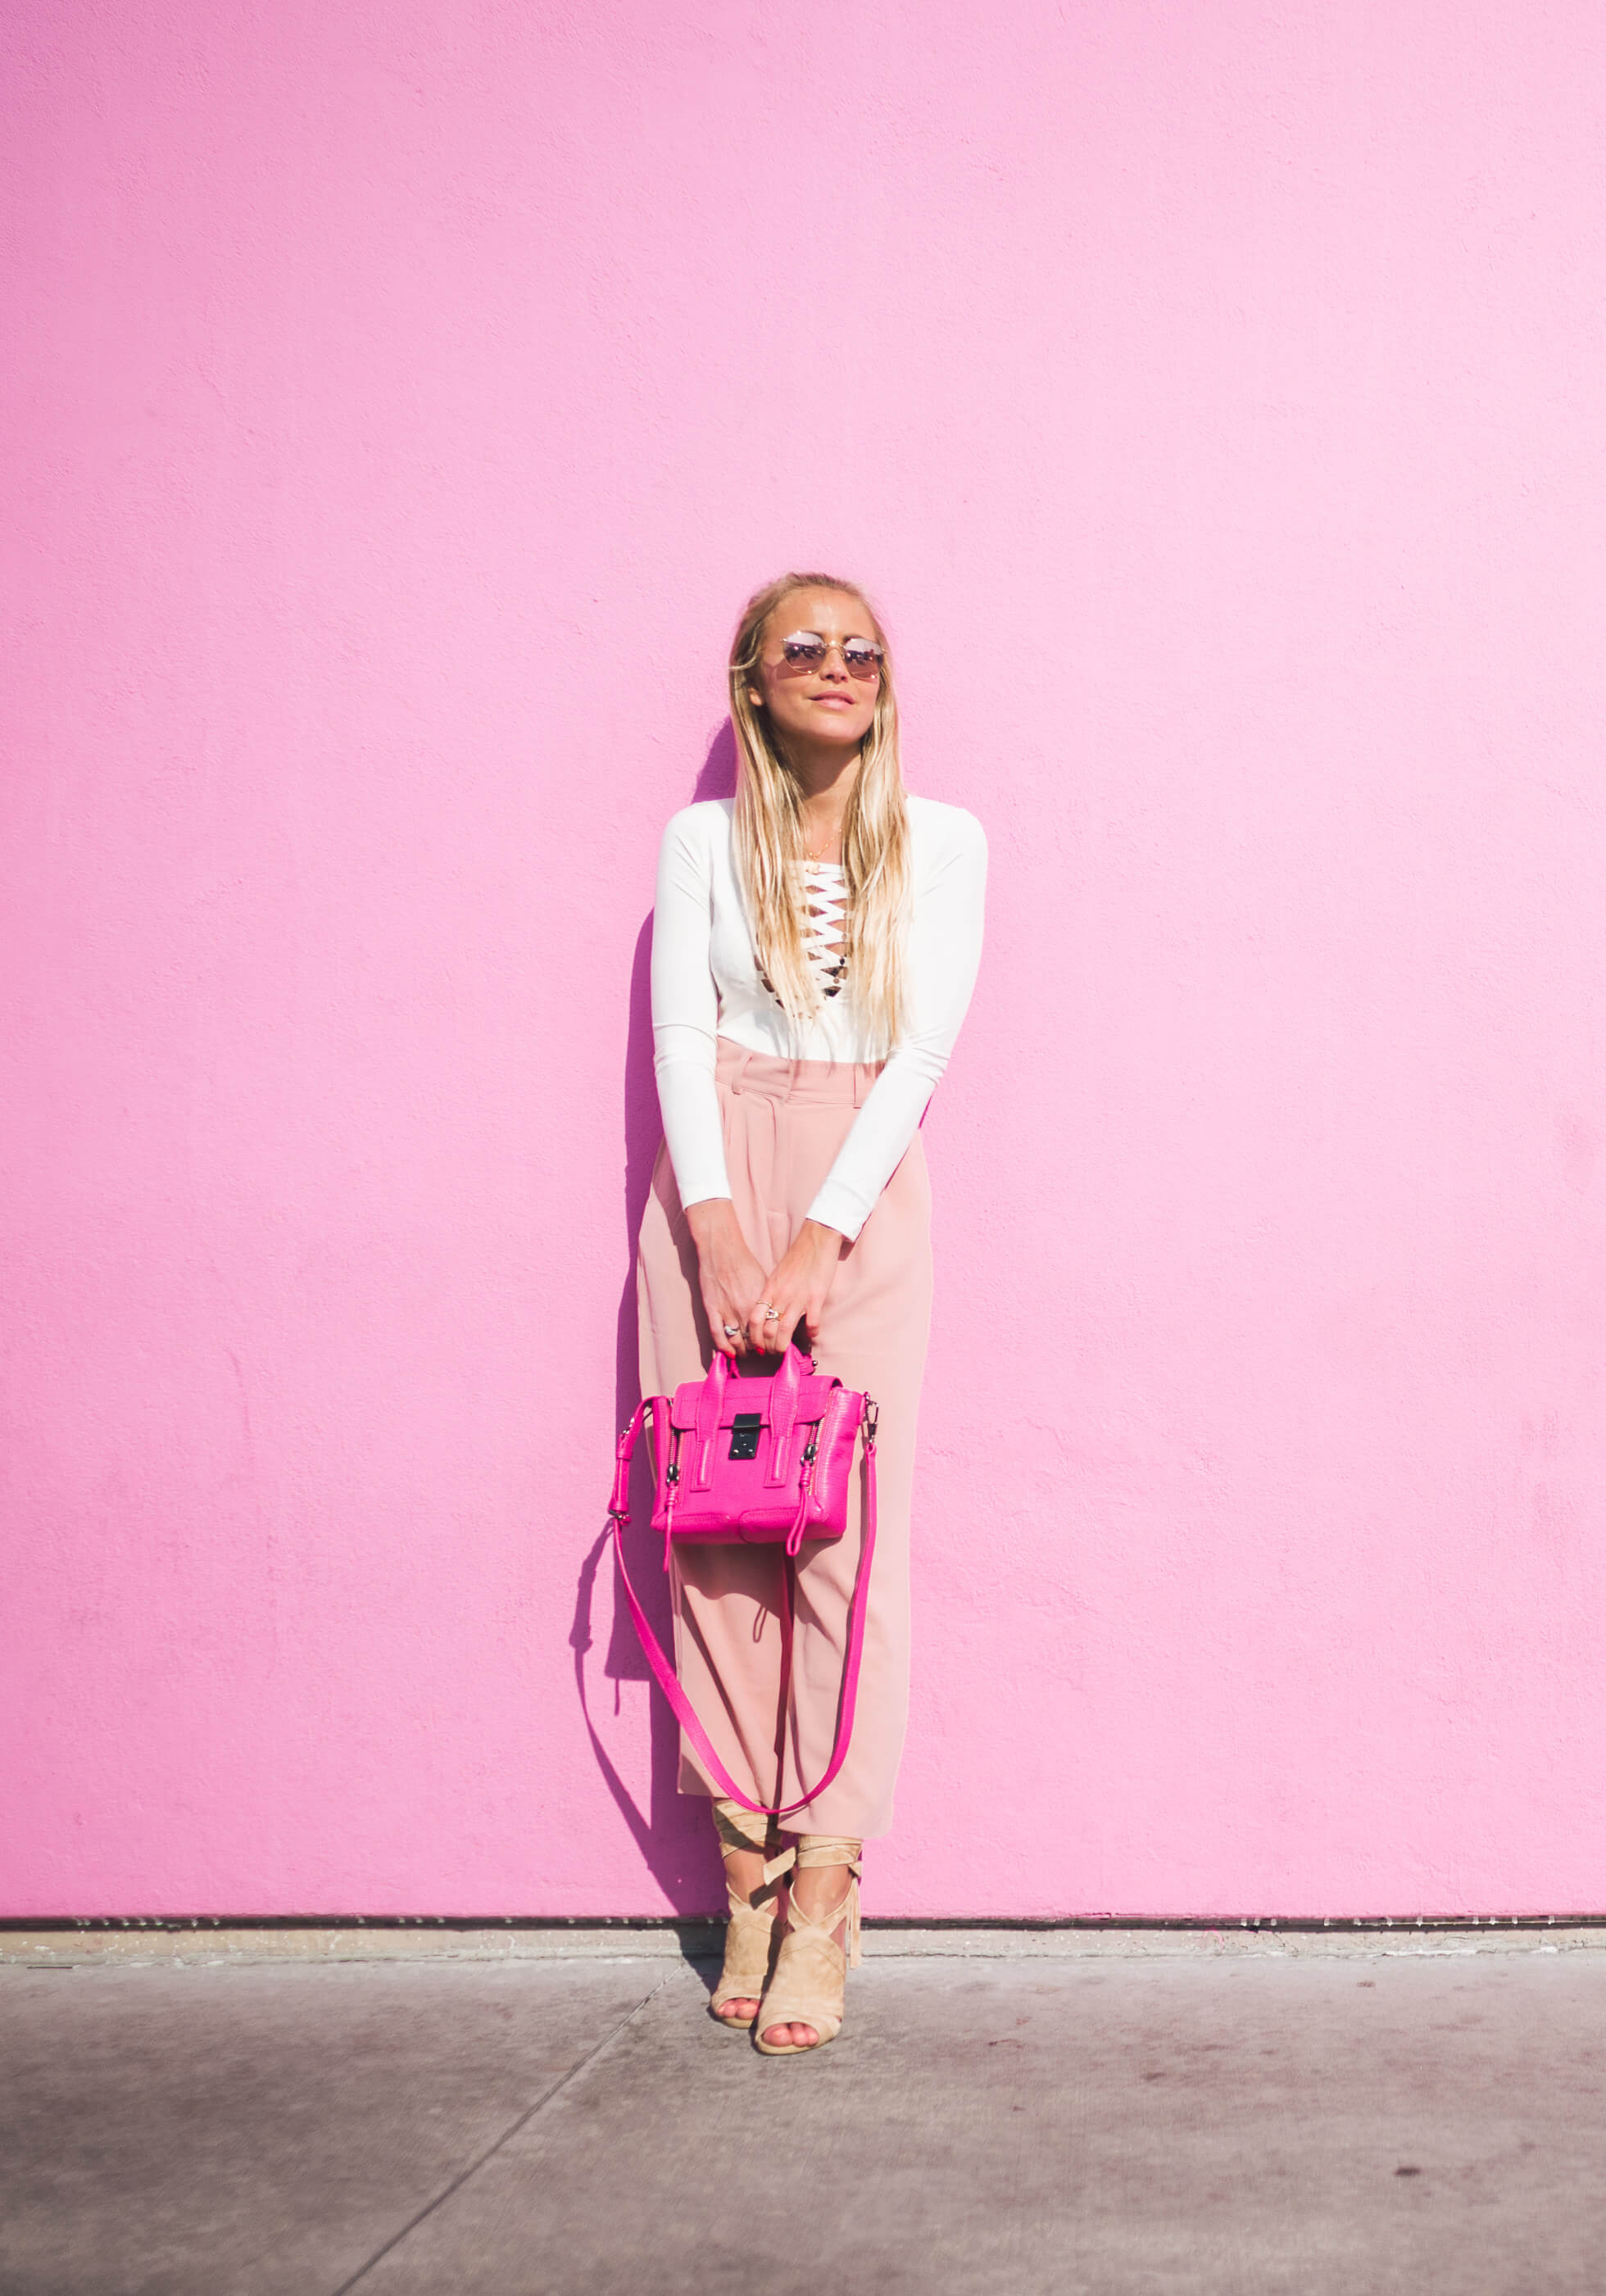 janni-deler-pink-wallL1020852